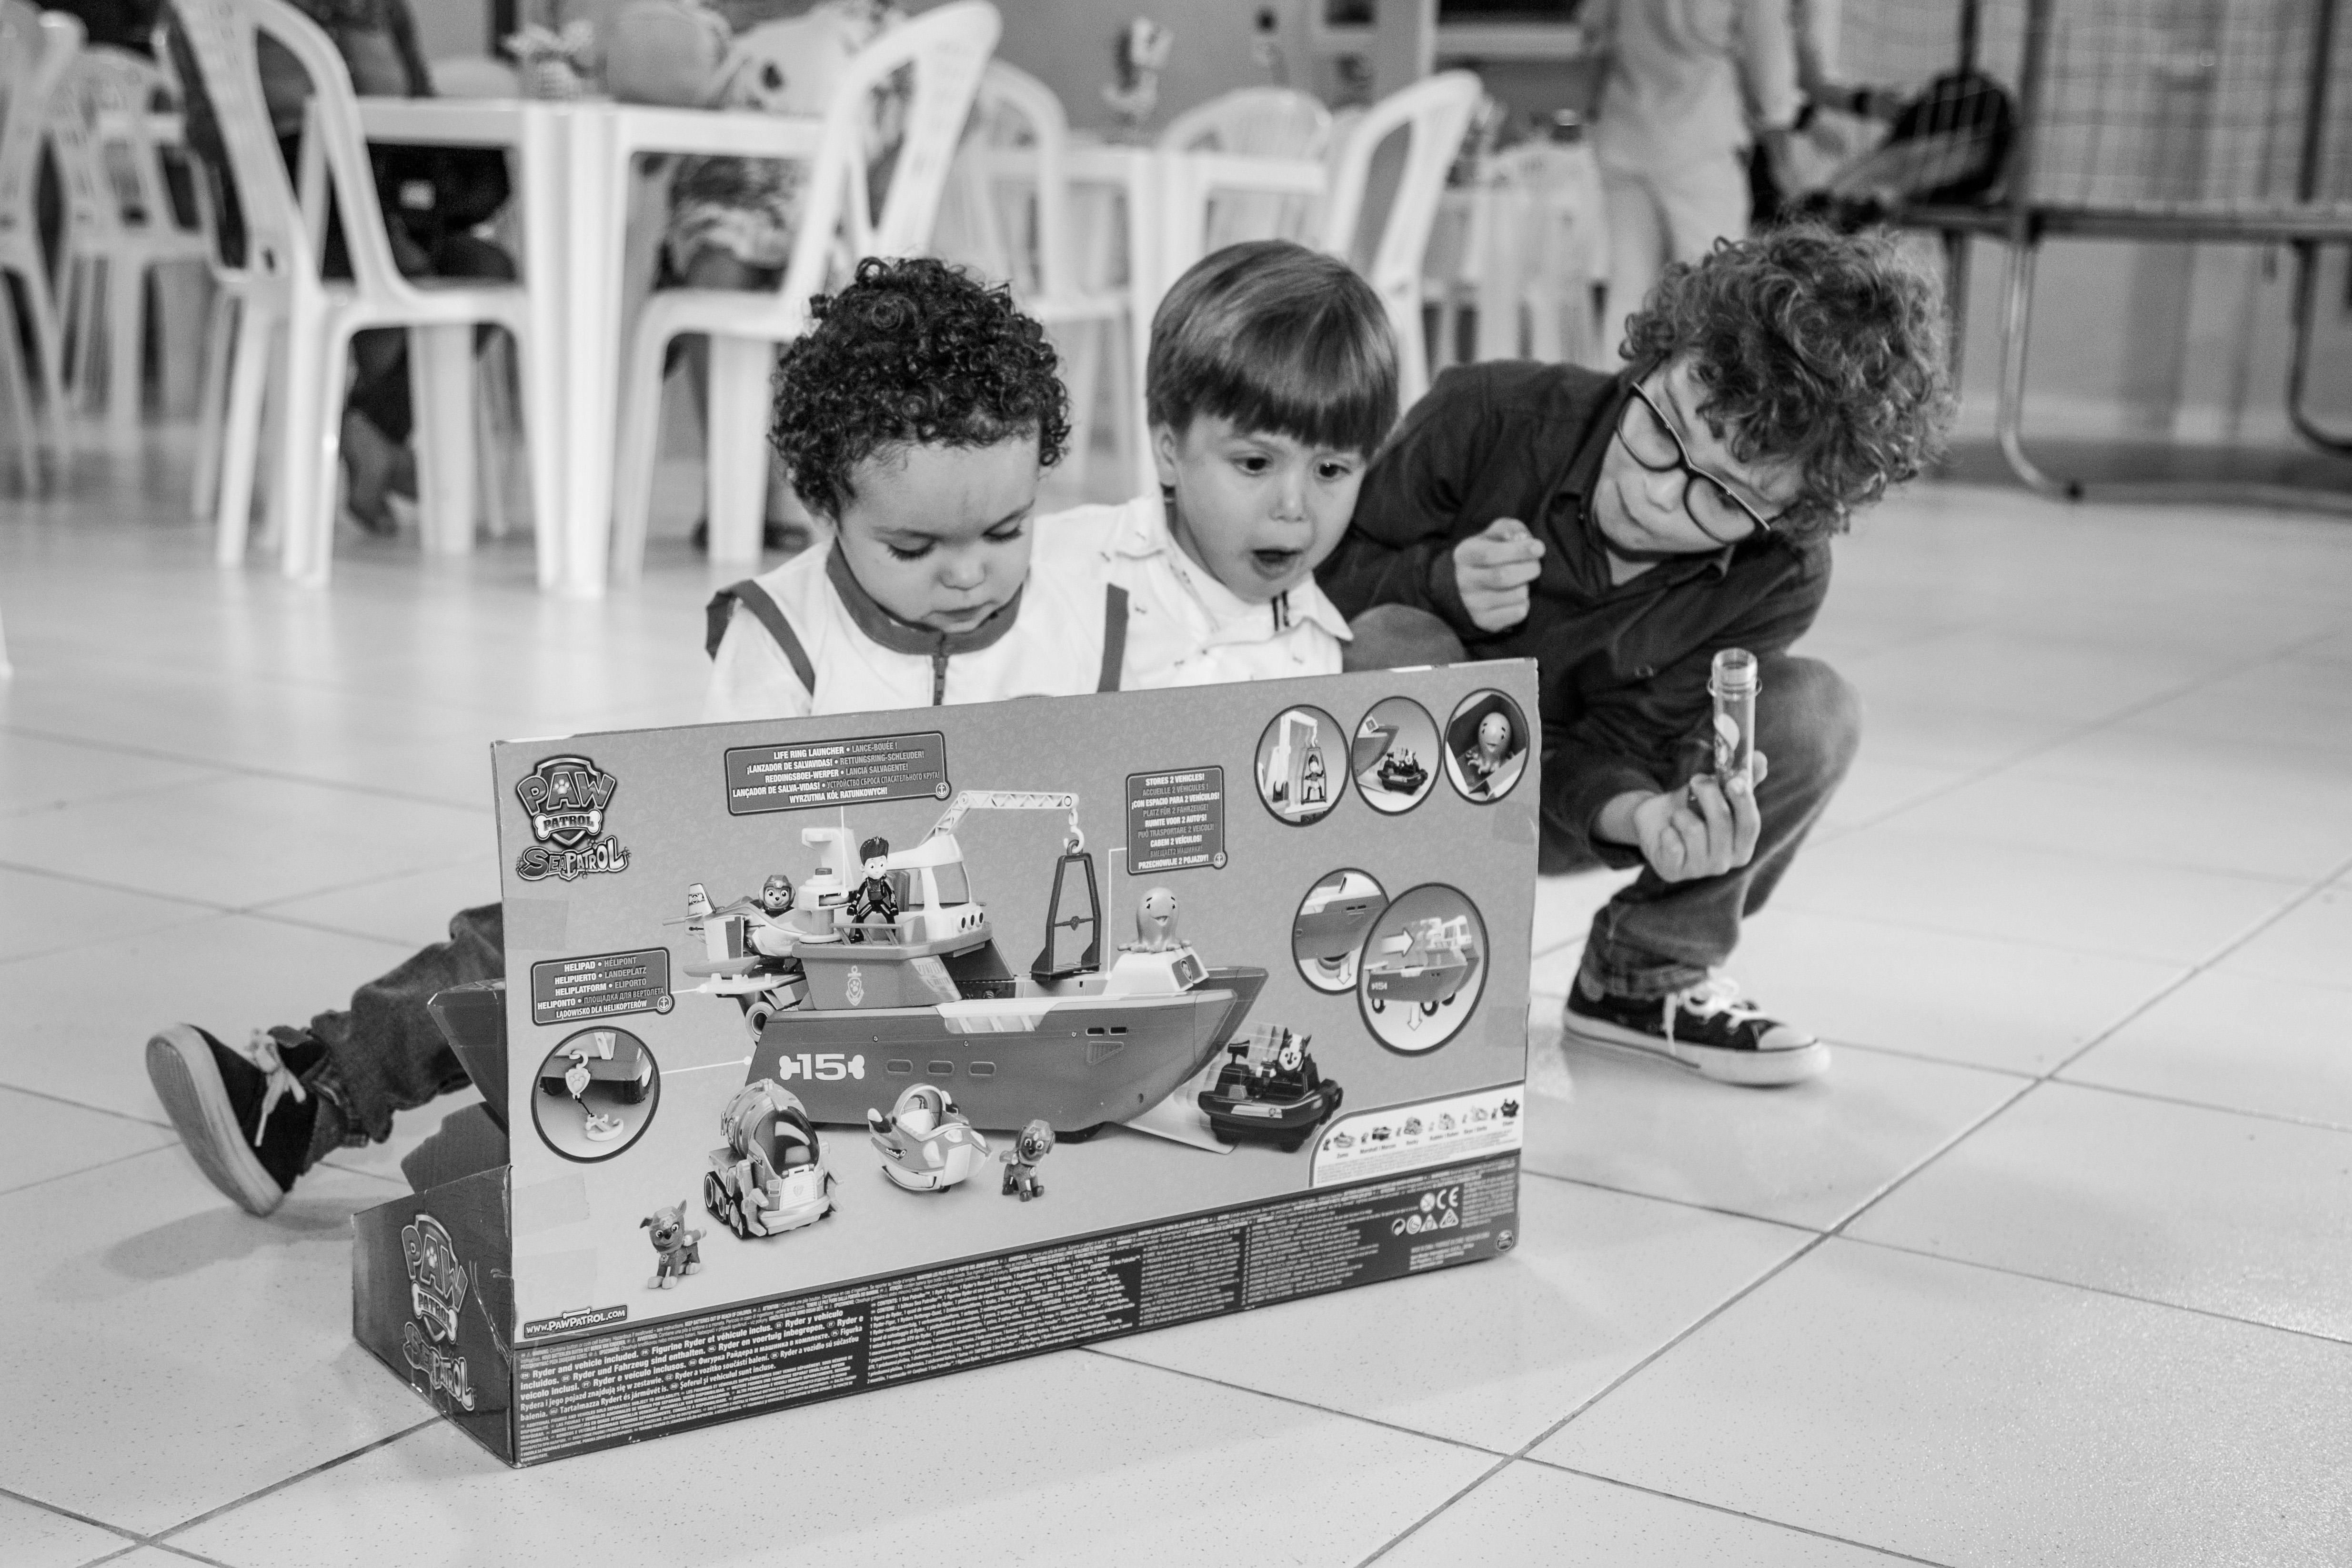 Festa‐Infantil‐Florianopolis‐Ana‐Marmo‐FotografiaFesta‐Infantil‐Florianopolis‐Ana‐Marmo‐Fotografia191A0421